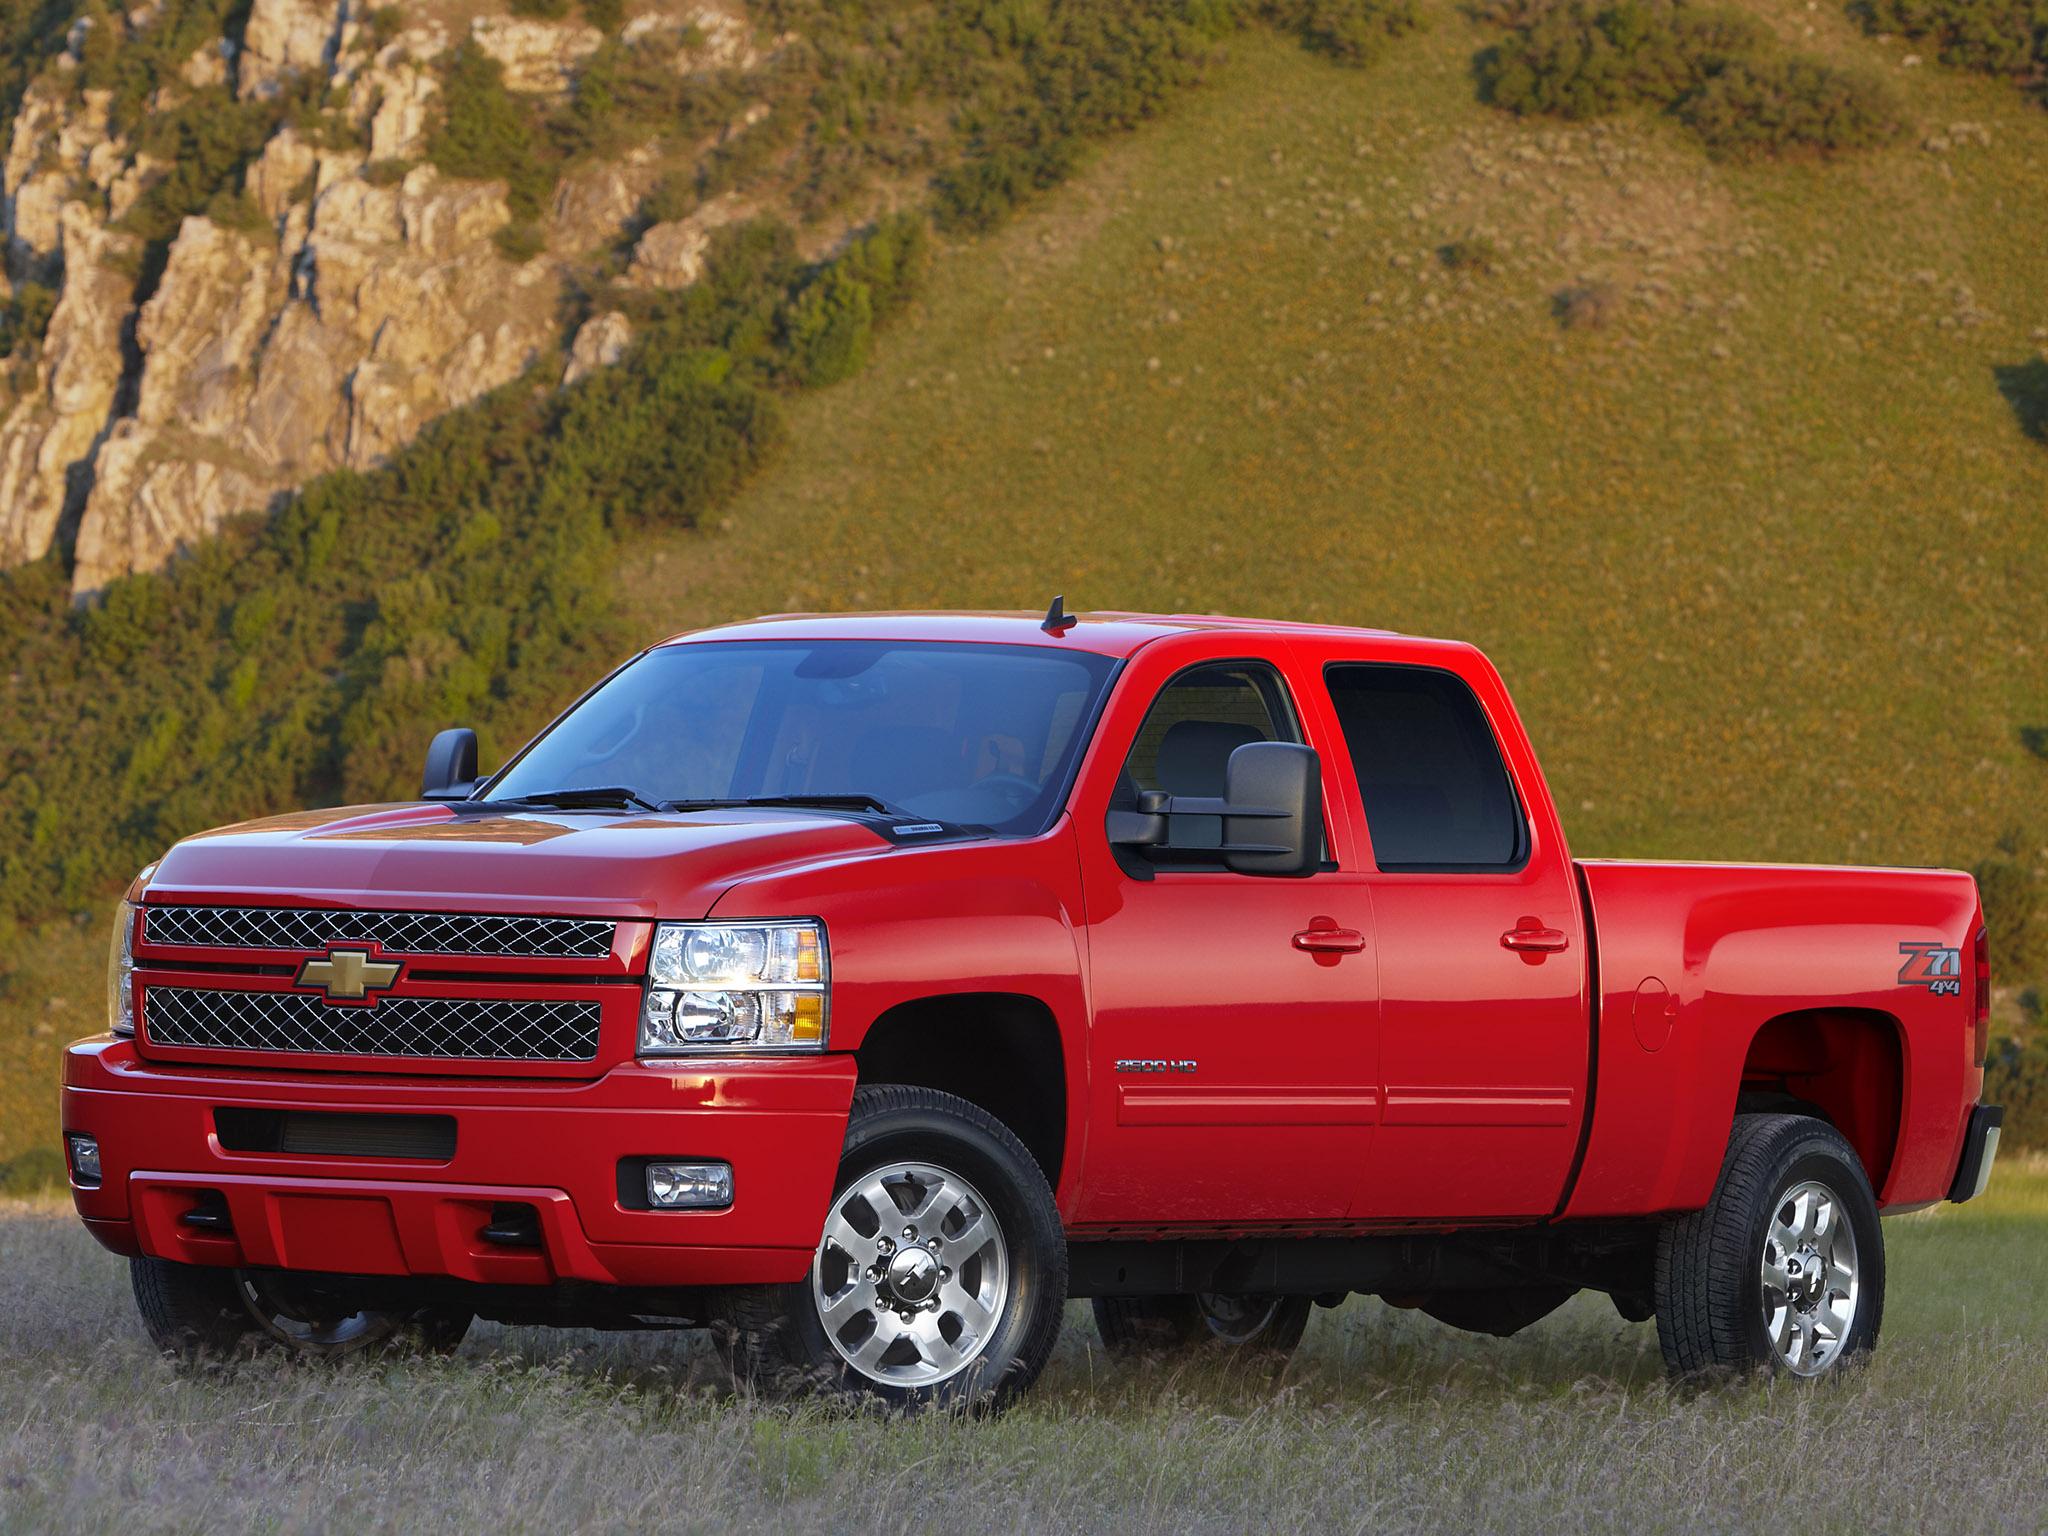 ... Chevrolet Silverado 2500 heavy truck 4x4 z71 f wallpaper background